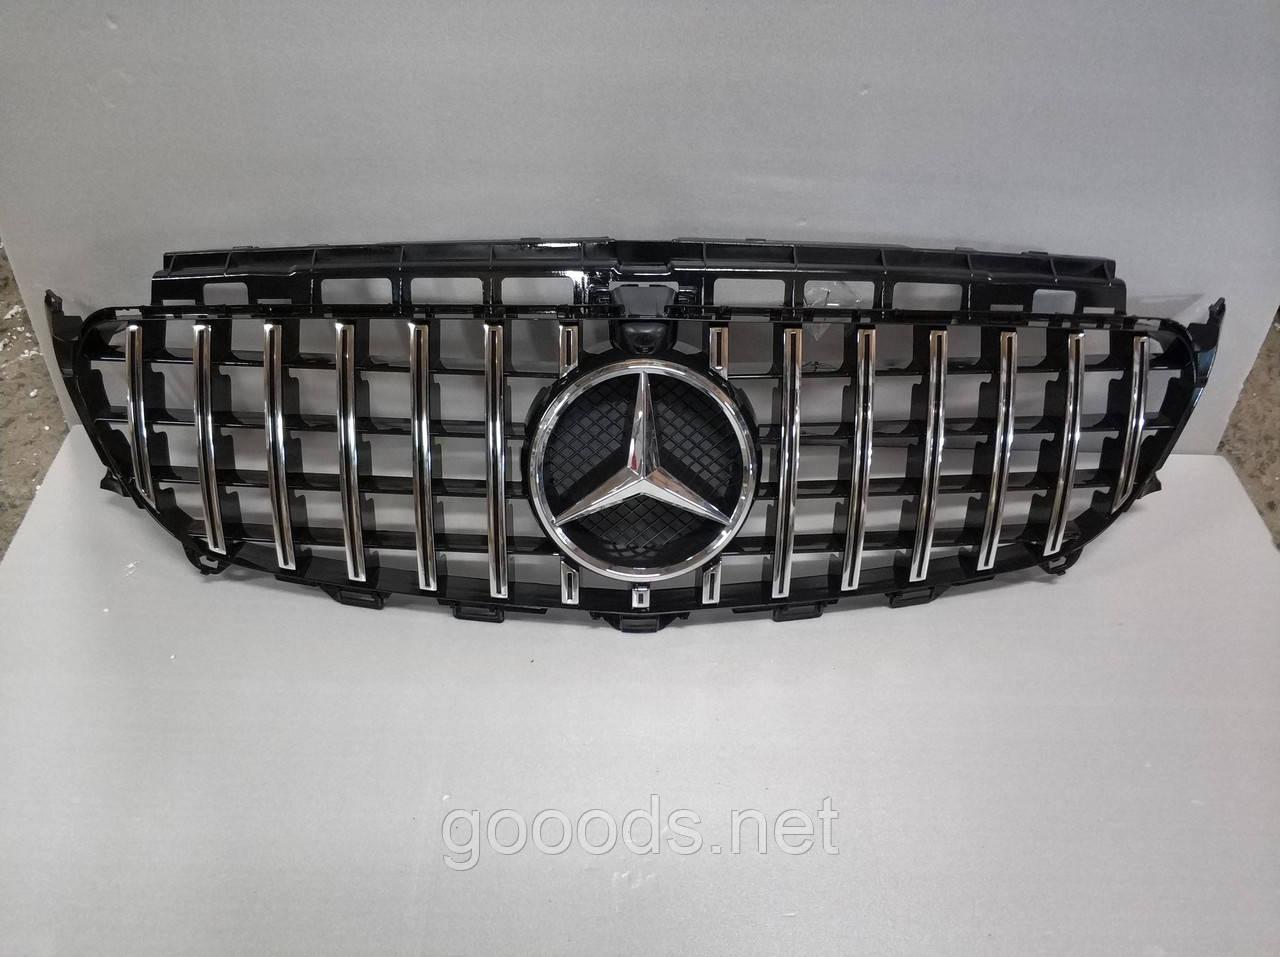 Решітка радіатора GT-style Mercedes E-class W213, Black/Chrome